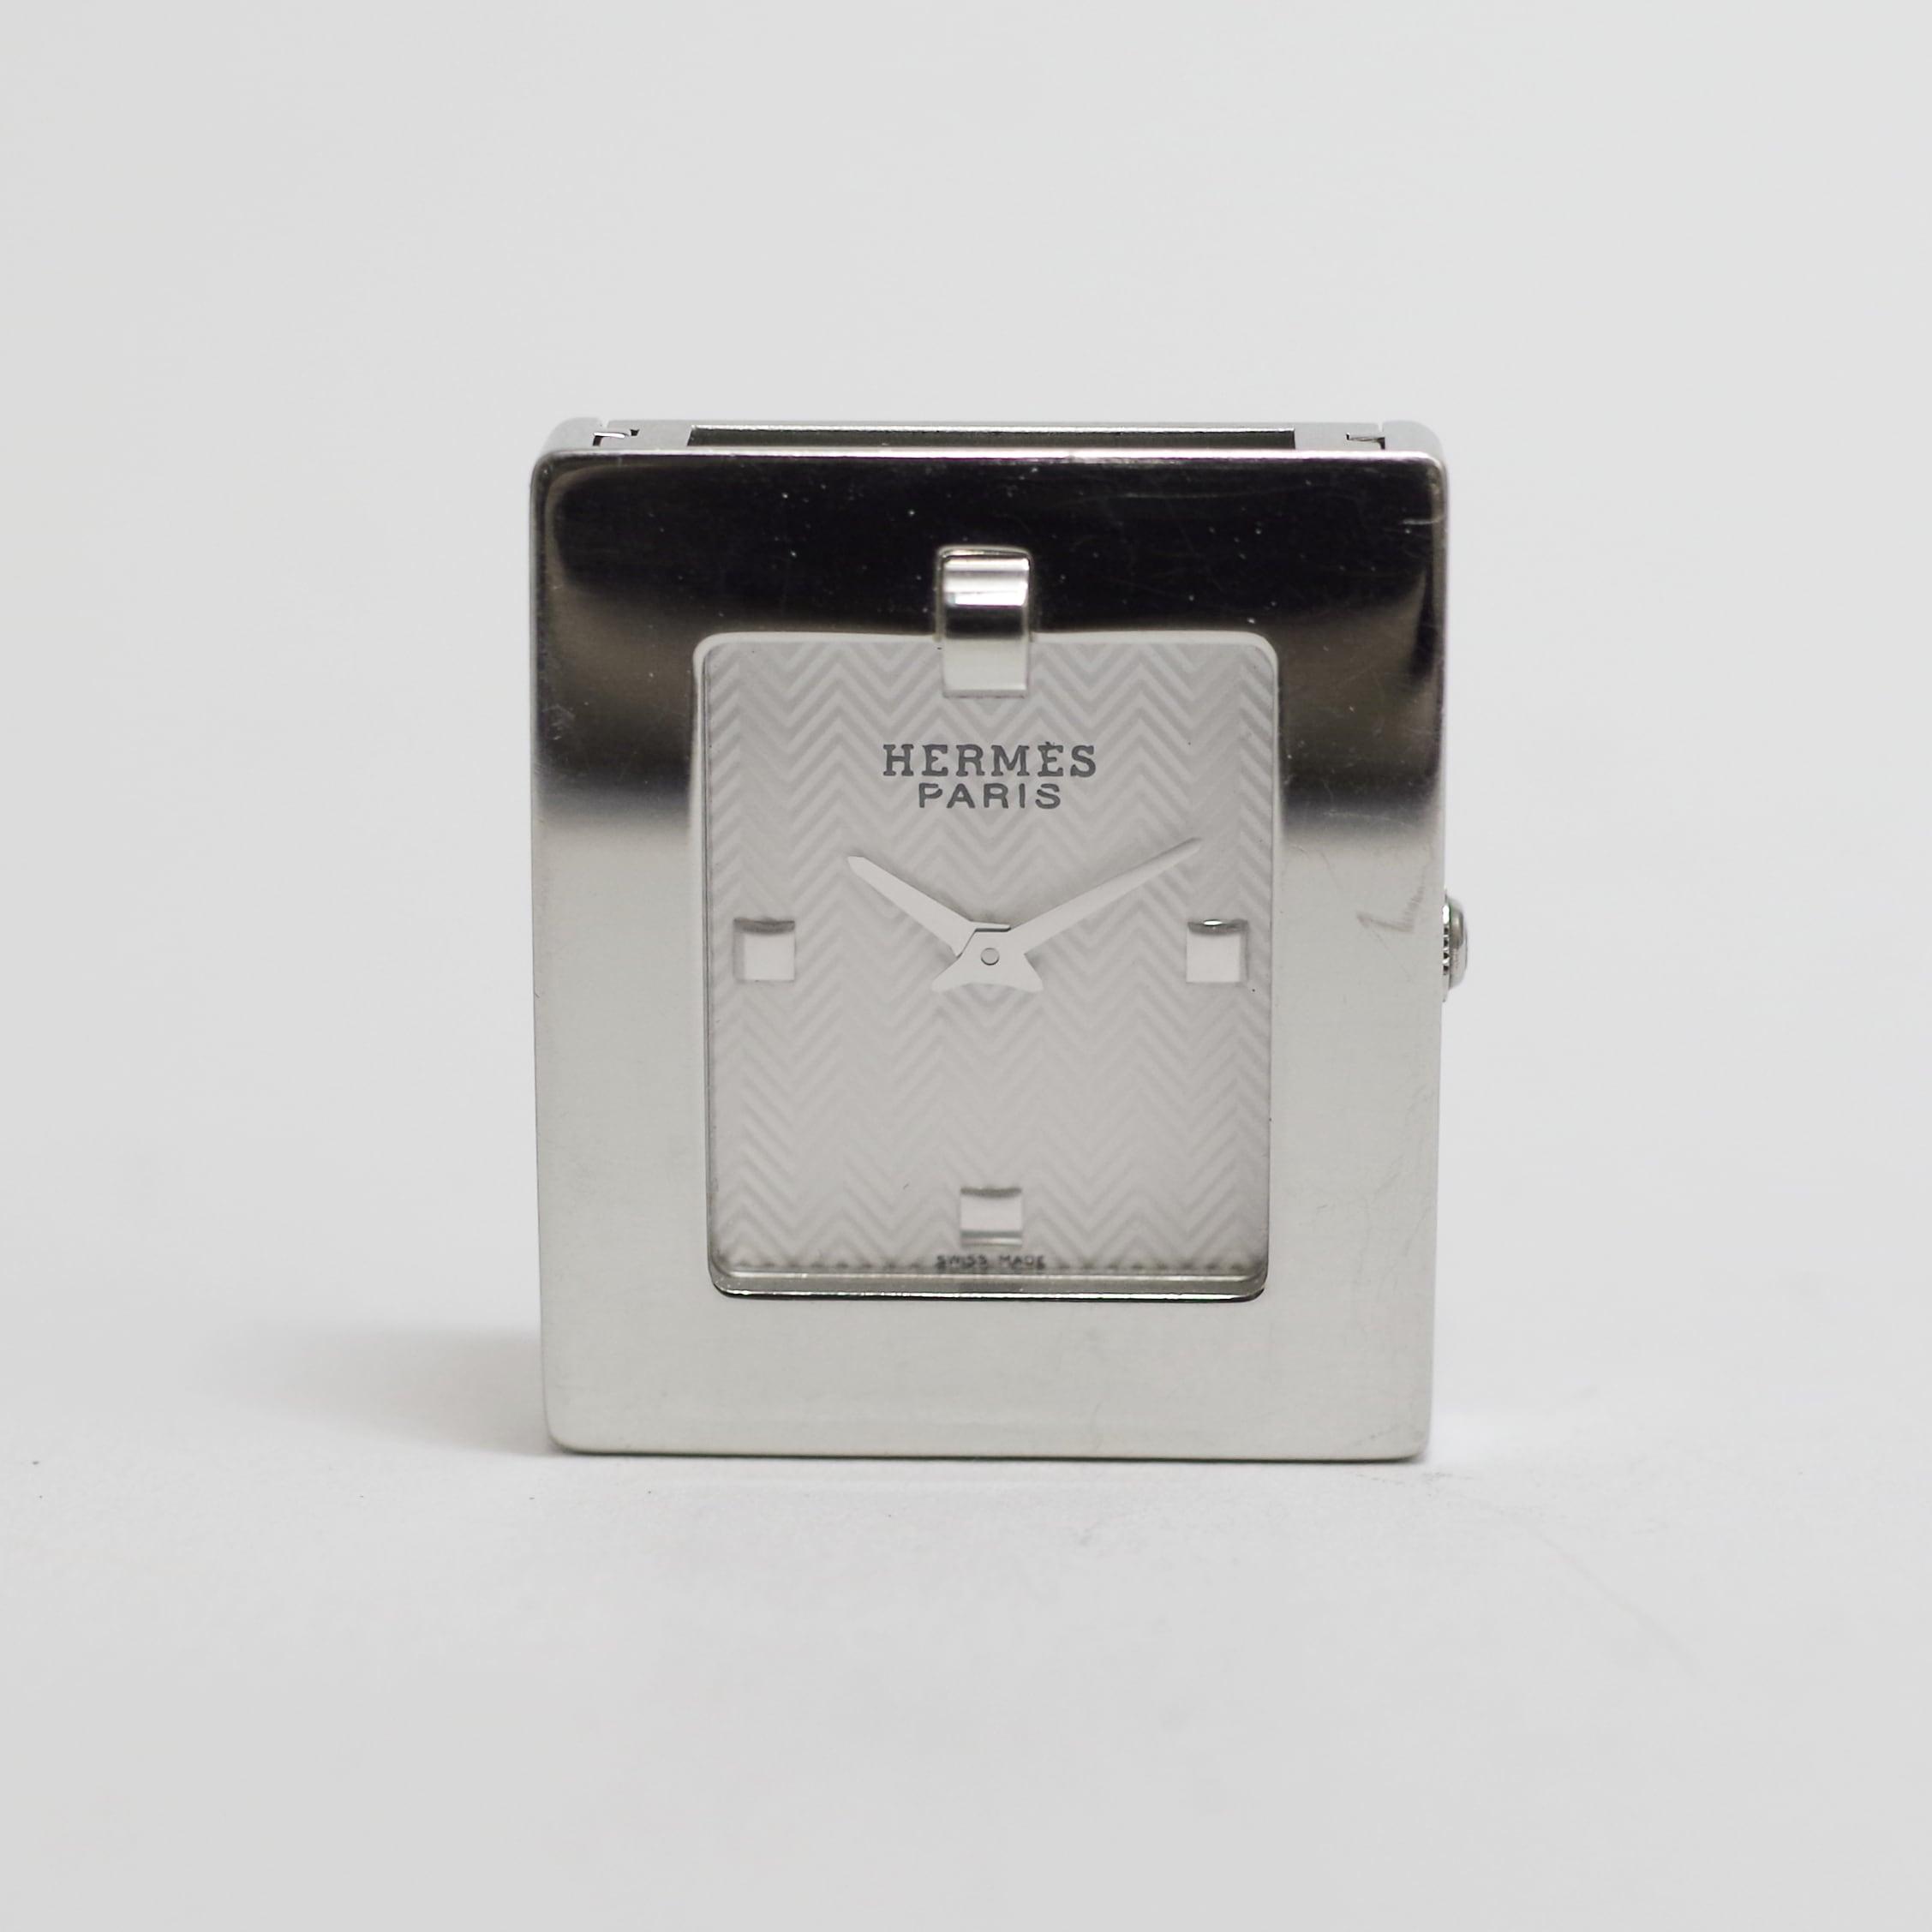 HERMES エルメス ベルトウォッチ SS クォーツ 革ベルト 替えベルト付き 腕時計 レディース